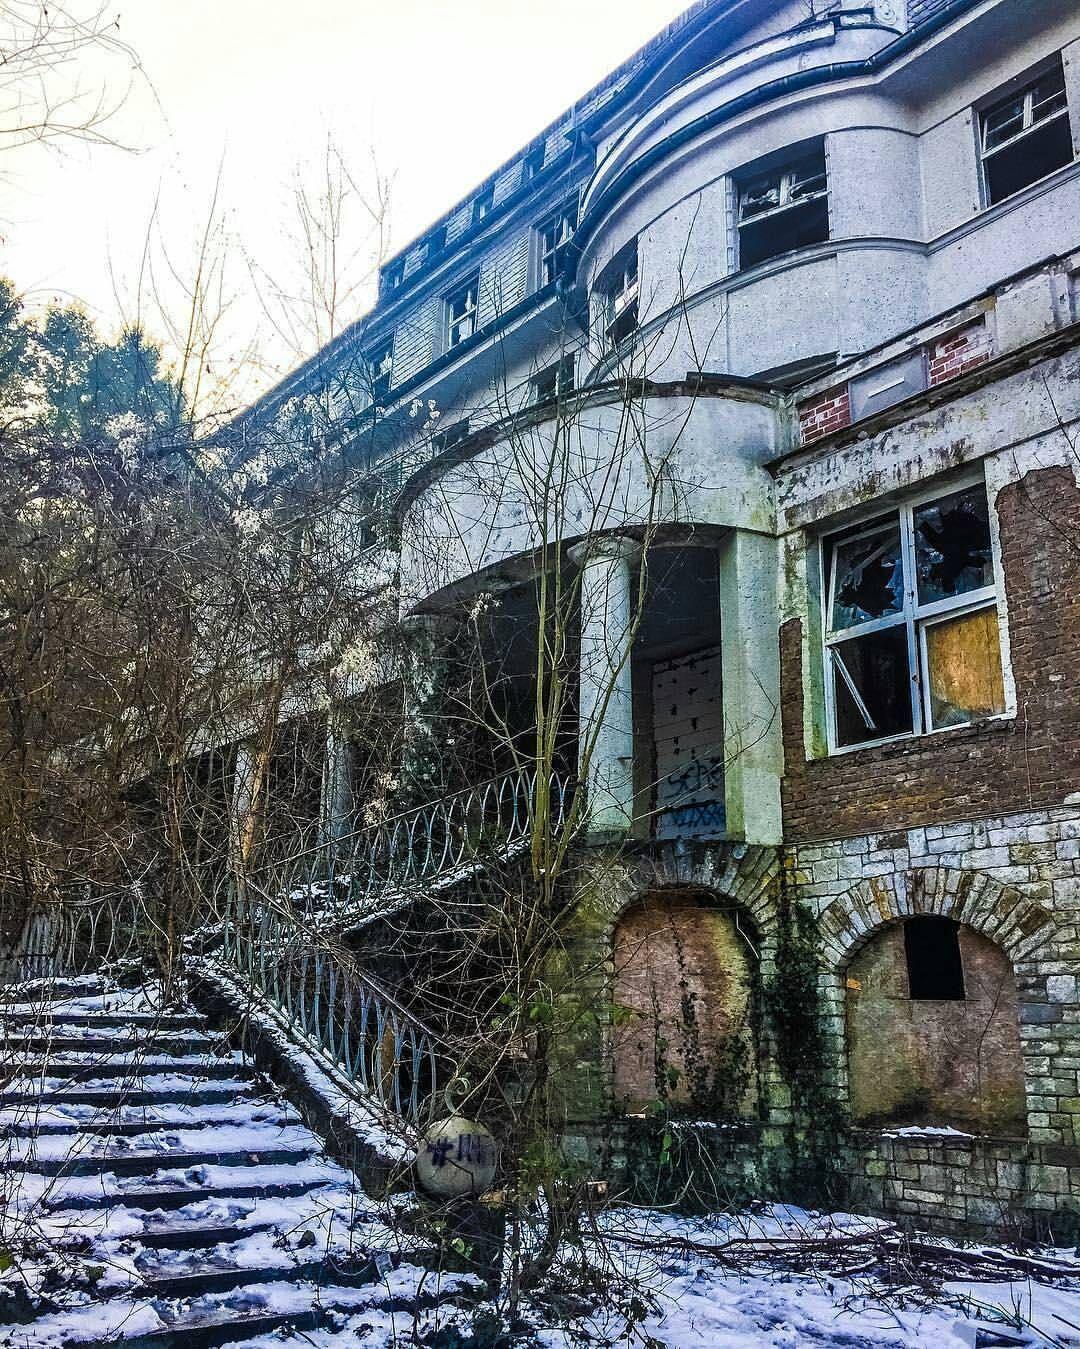 Lost Places Fotos: Gefällt 1,278 Mal, 19 Kommentare